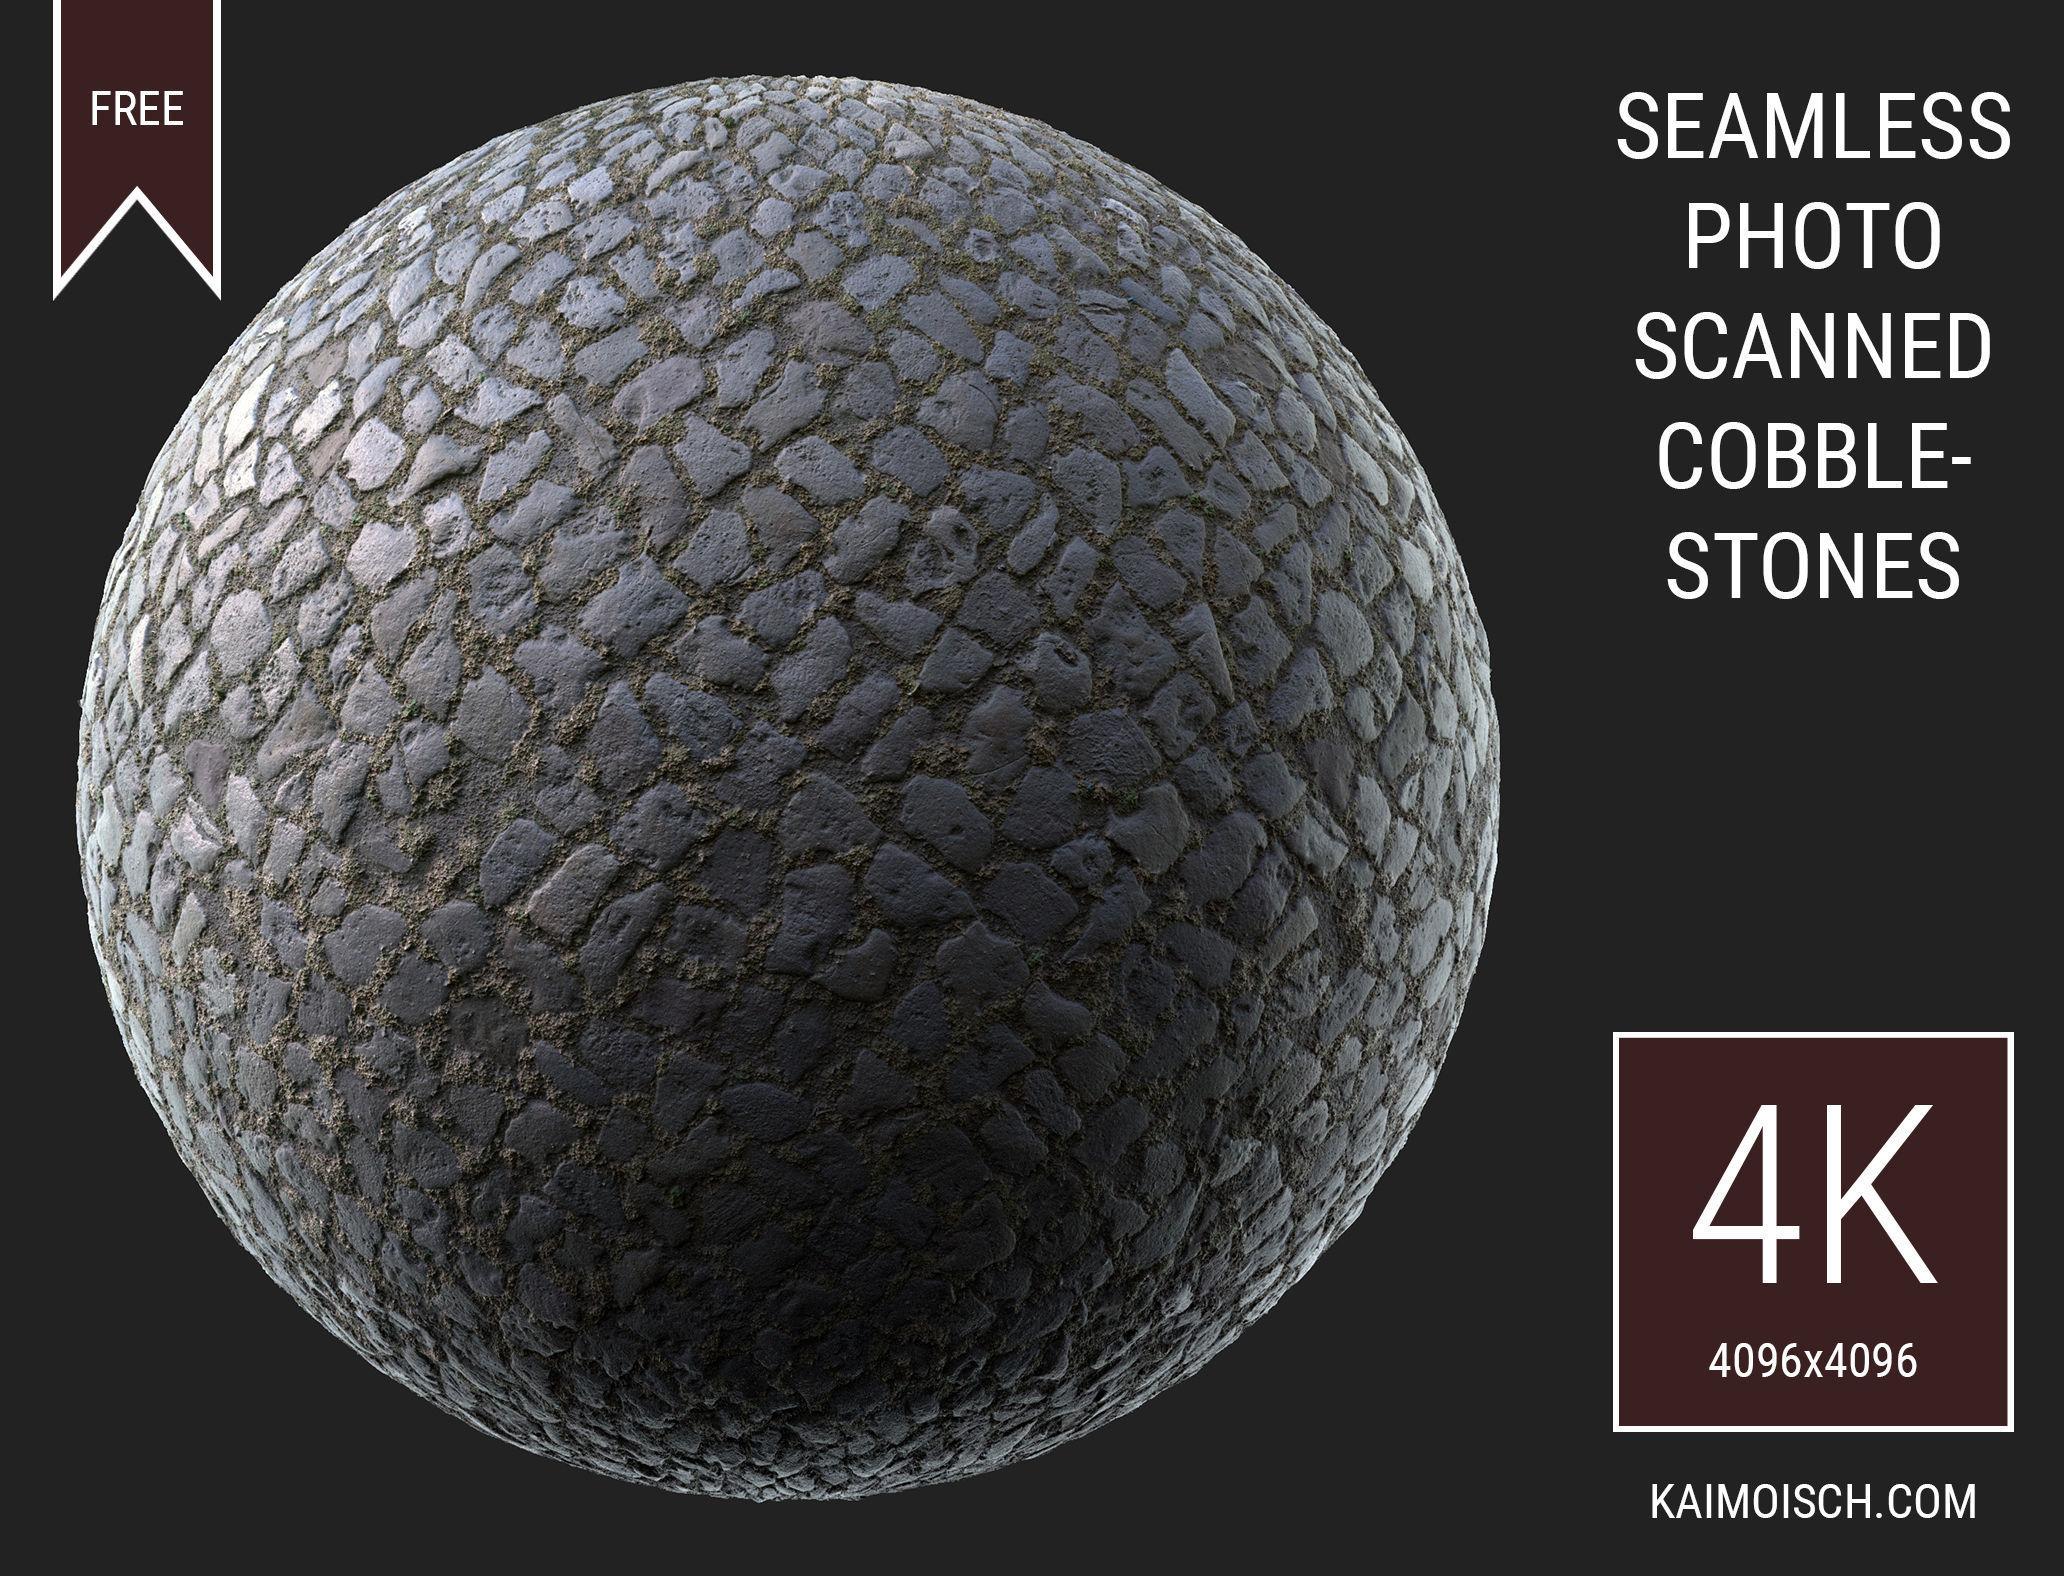 3D Scanned Seamless Cobblestone Pavement